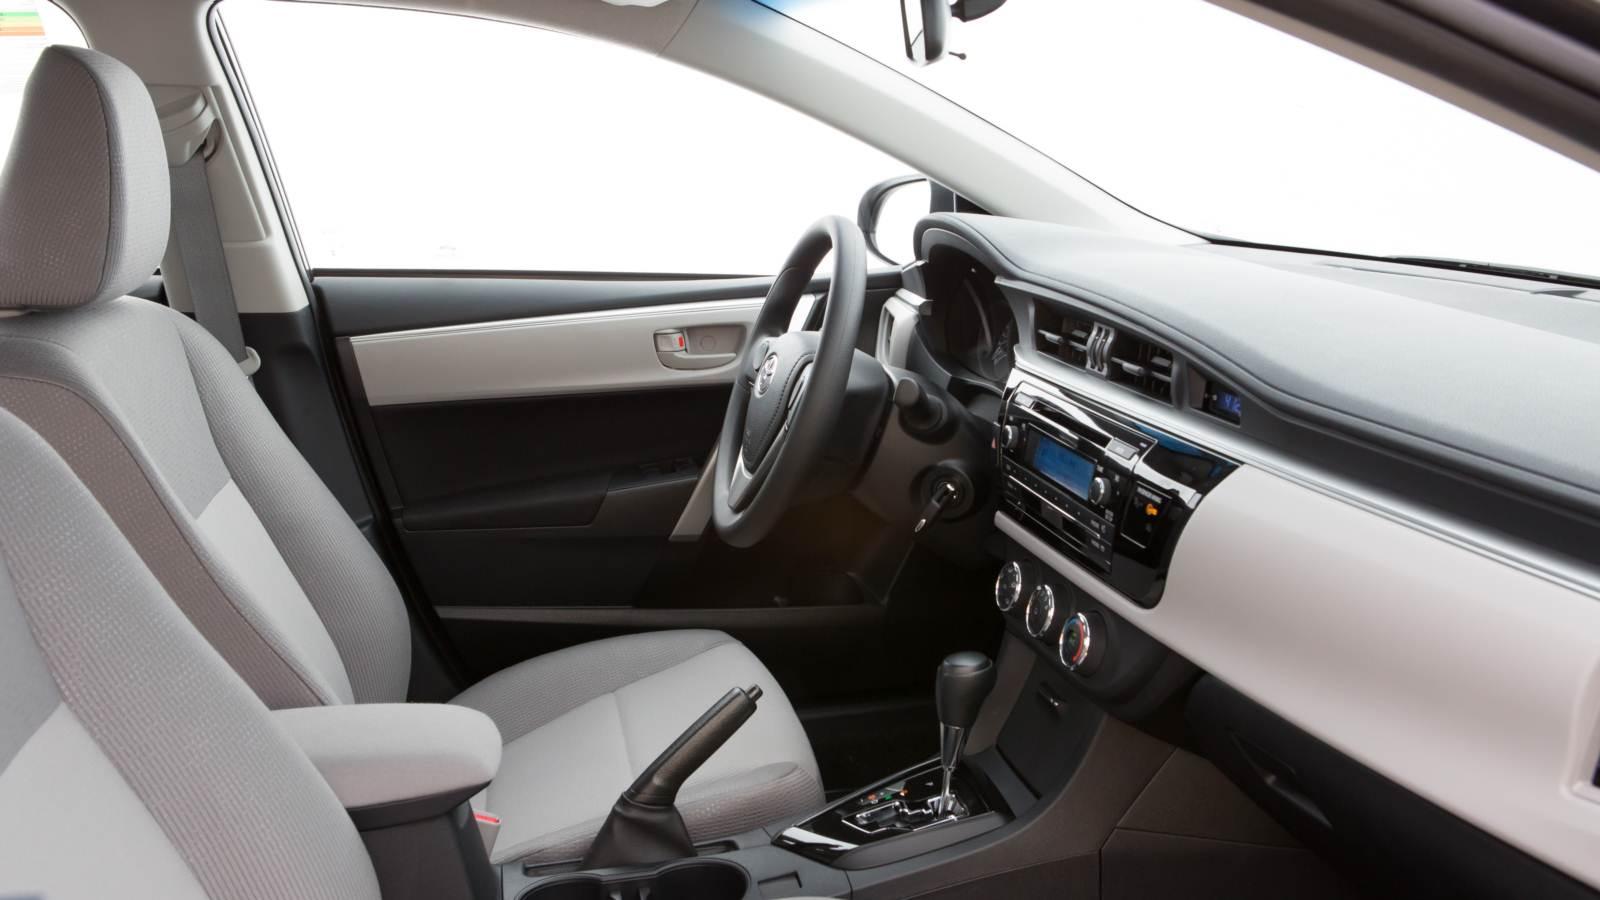 Novo Corolla XEi 2015 - interior - detalhe do sistema multimídia com